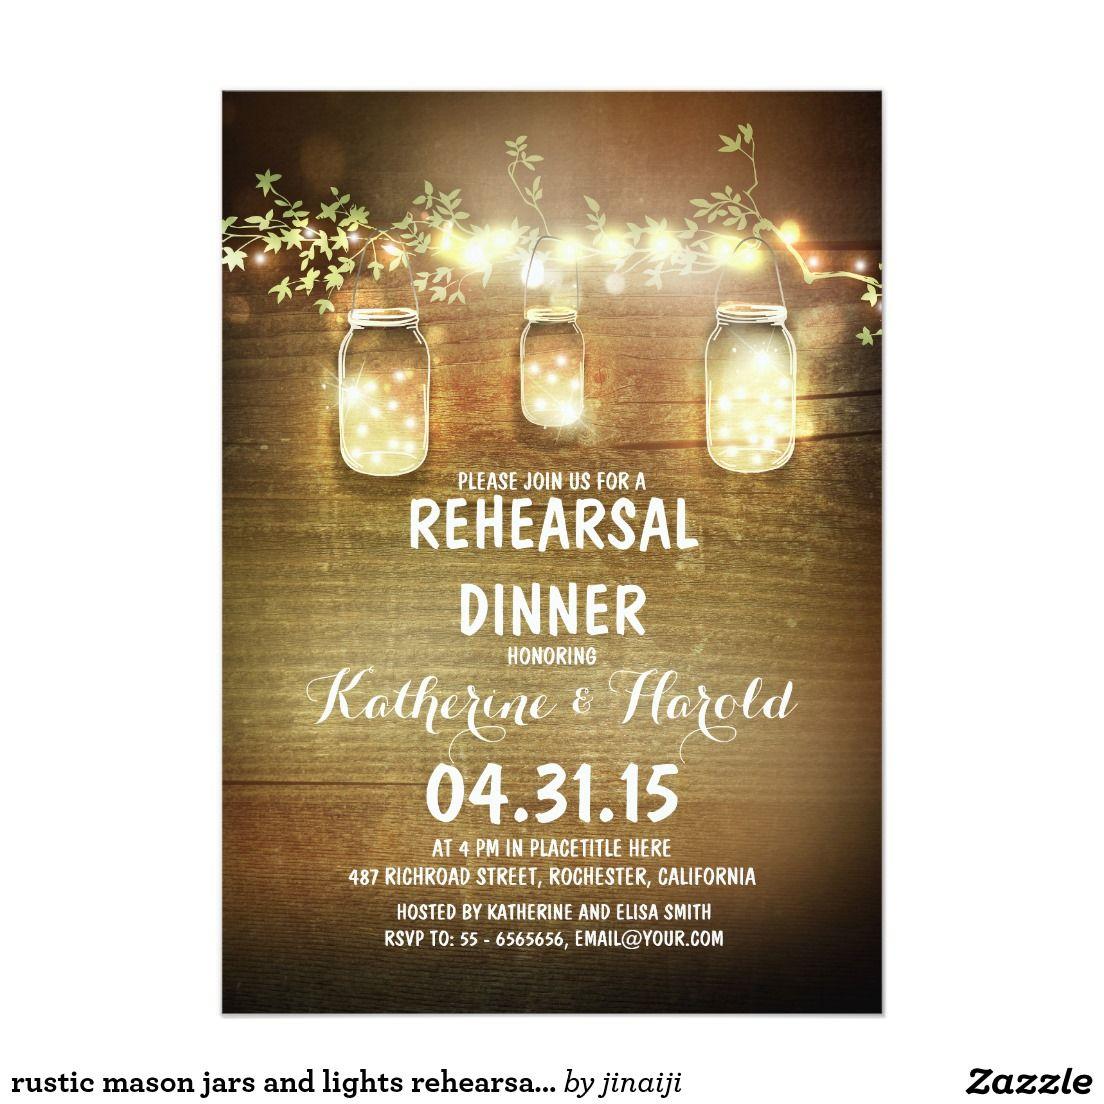 rustic mason jars and lights rehearsal dinner